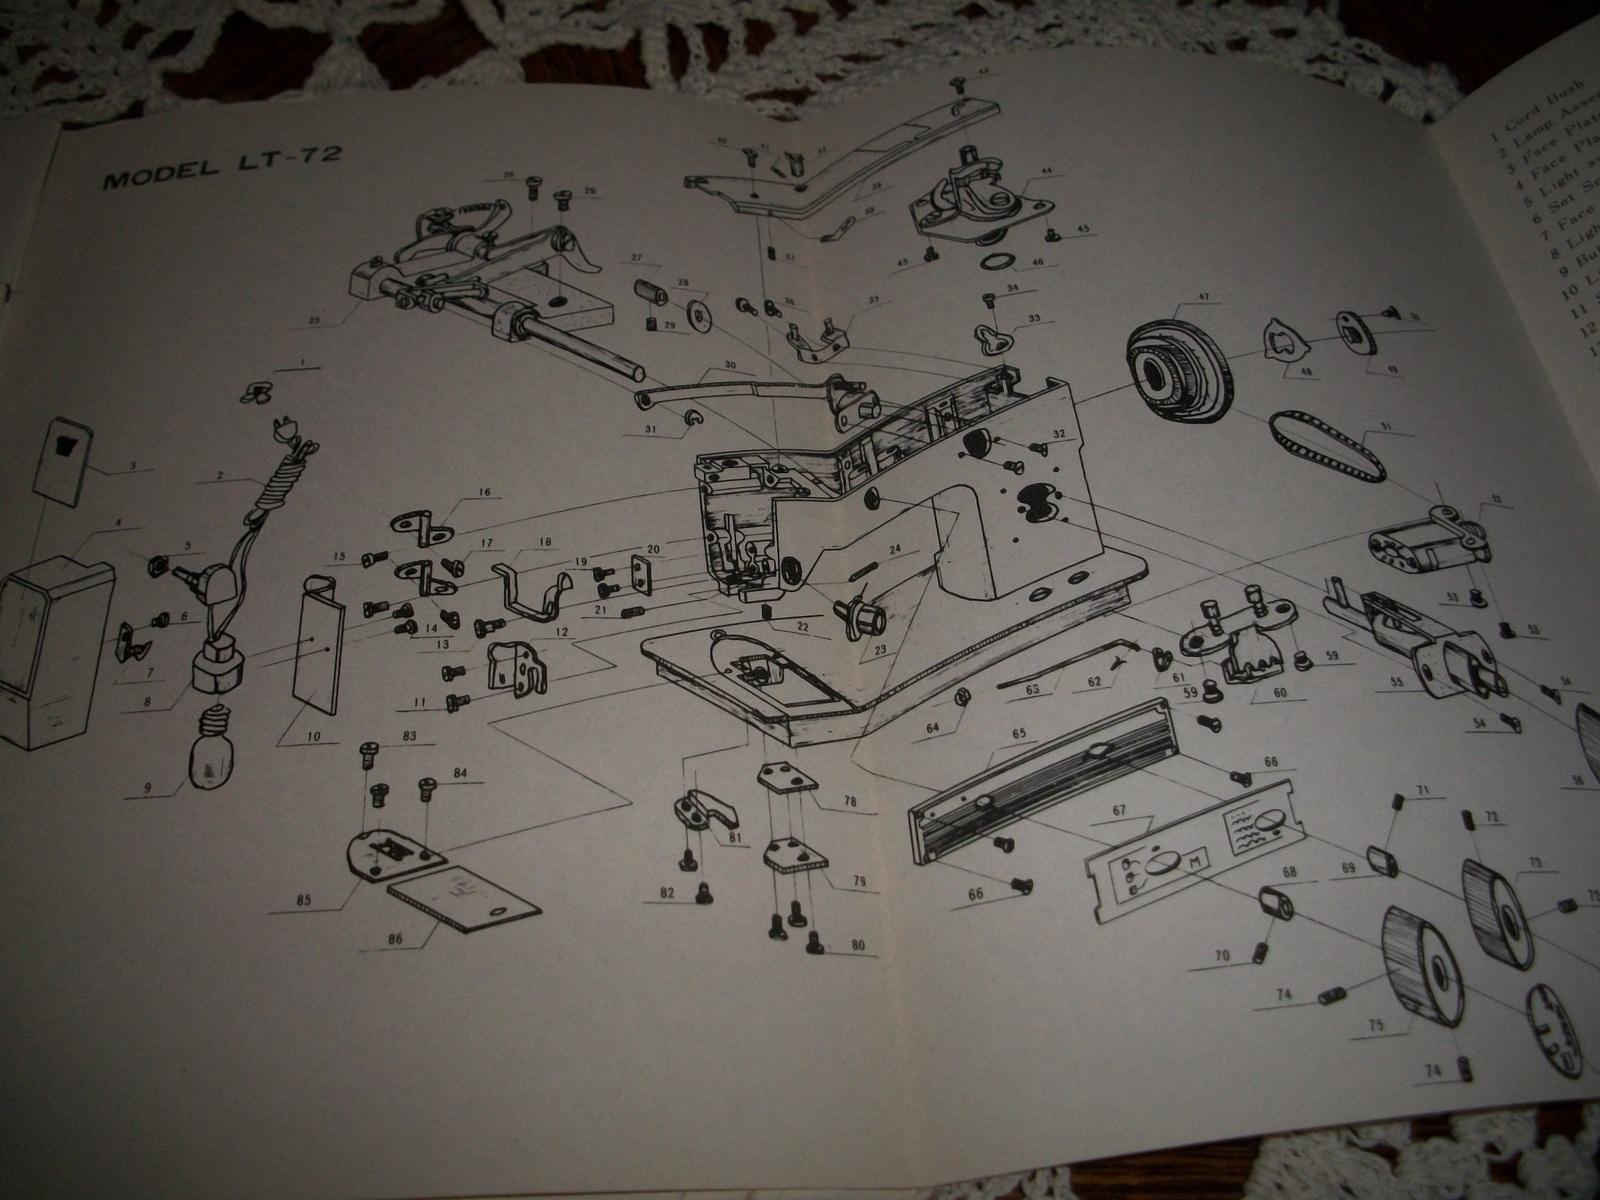 Emdeko Model LT-72 Sewing Machine Instruction Manual